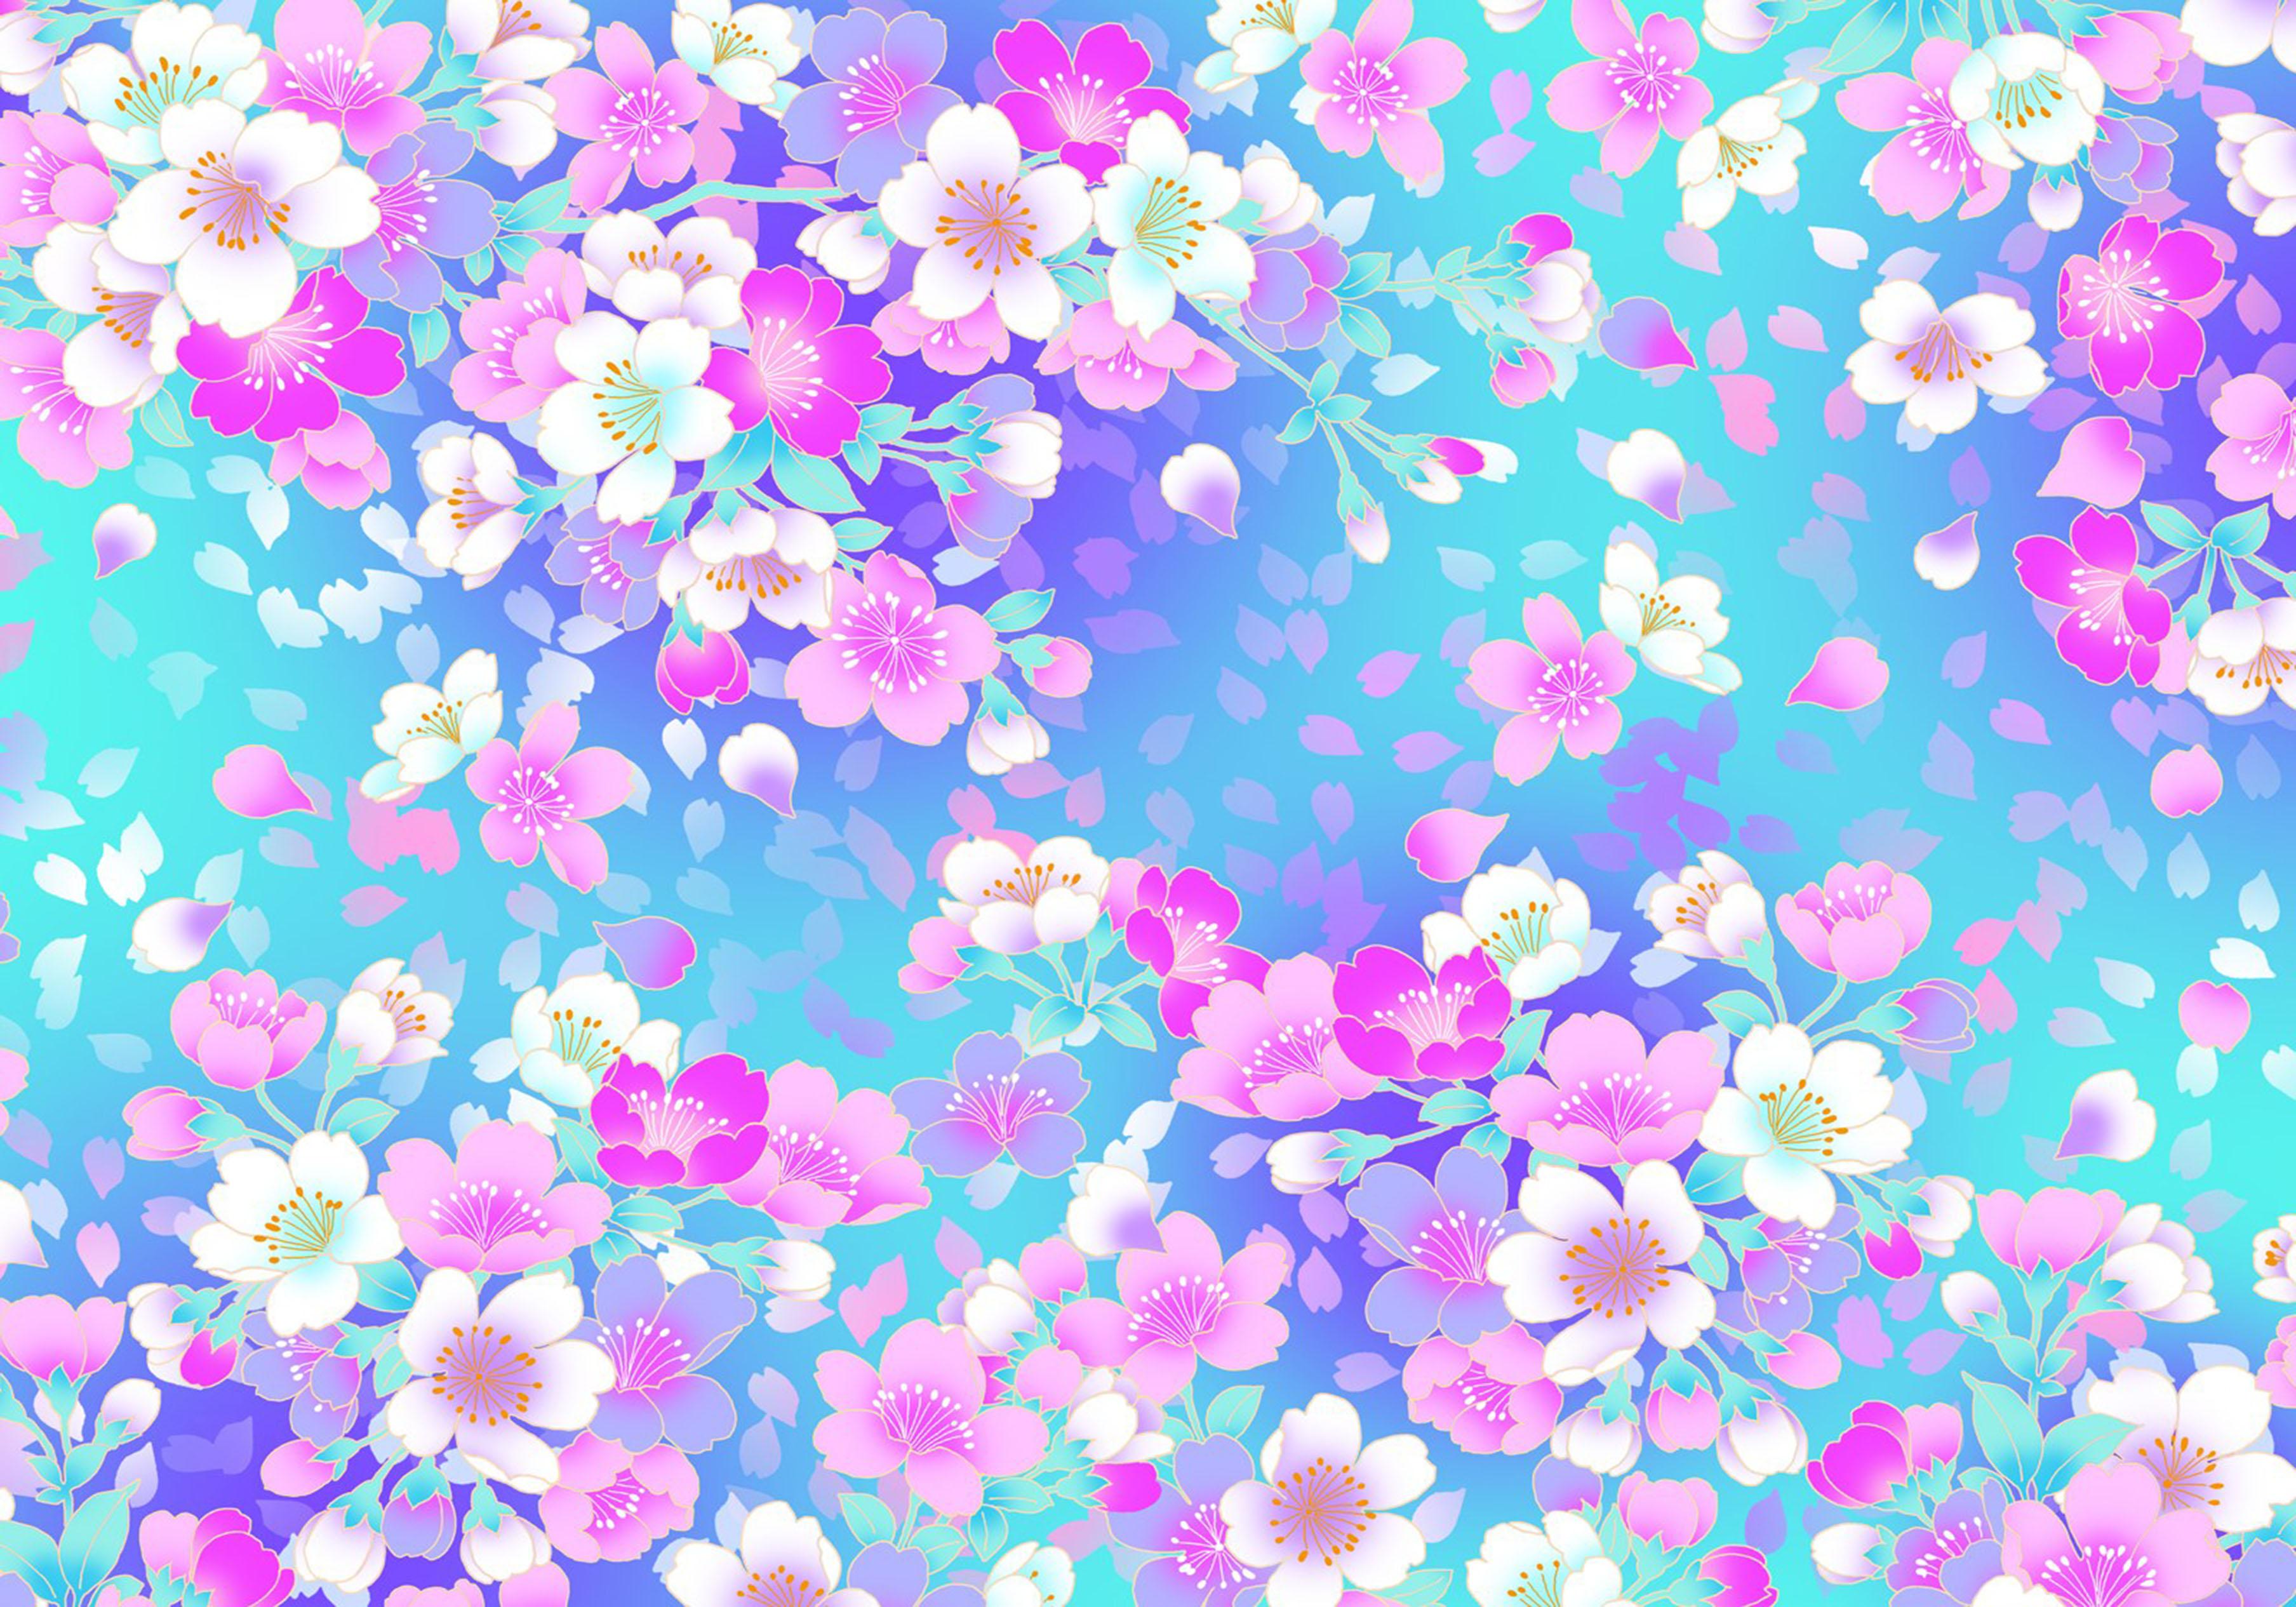 Origami Cherry Blossom Pattern